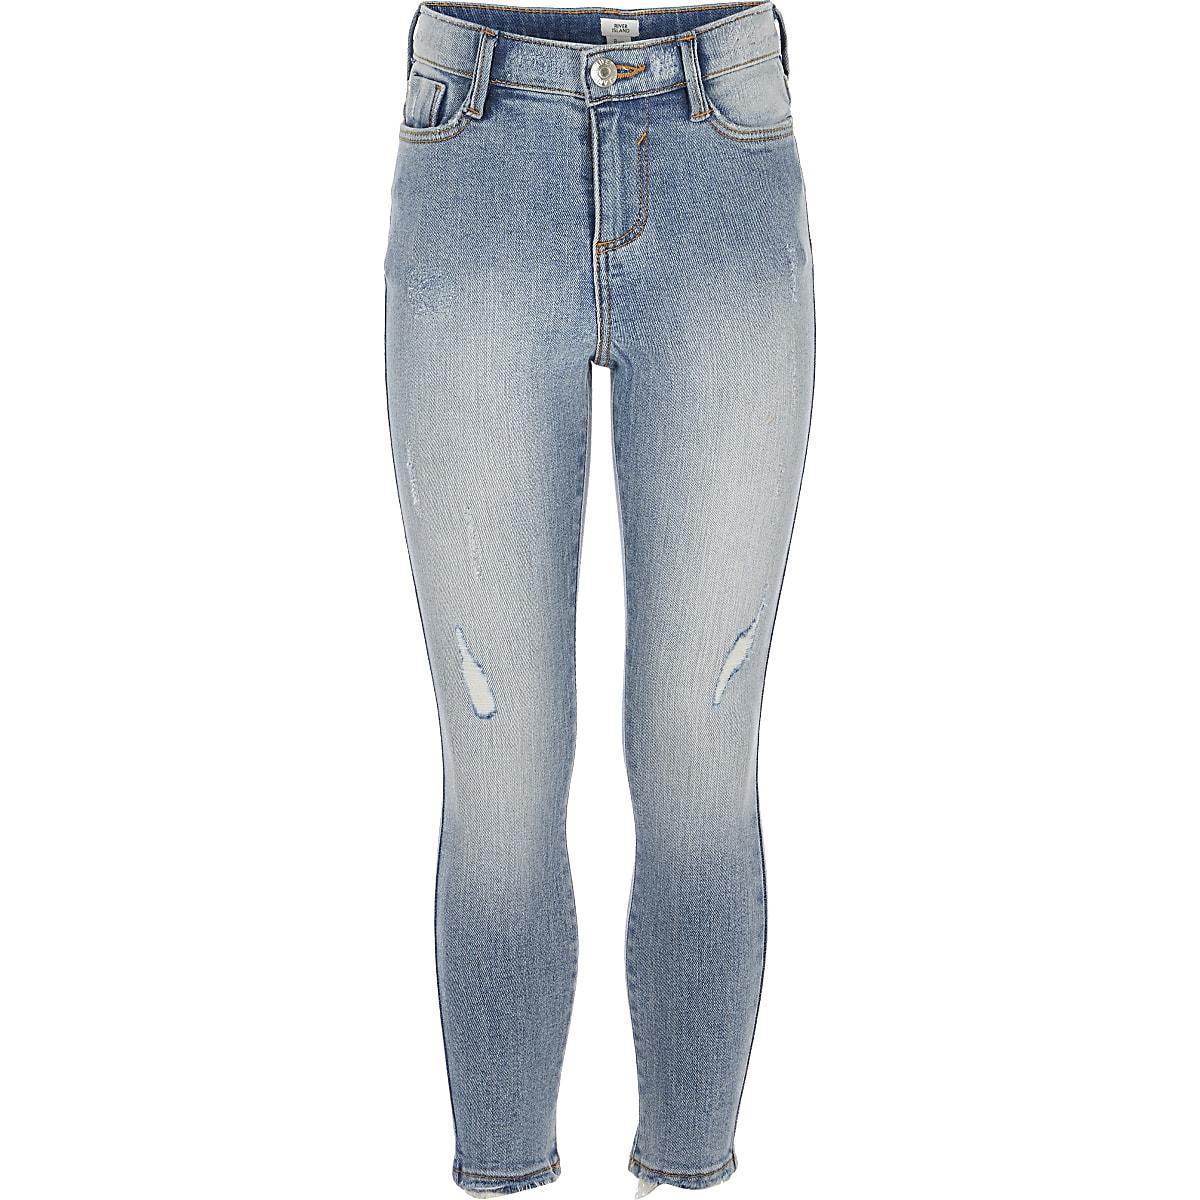 Amelie - Lichtblauwe skinny wash jeans voor meisjes